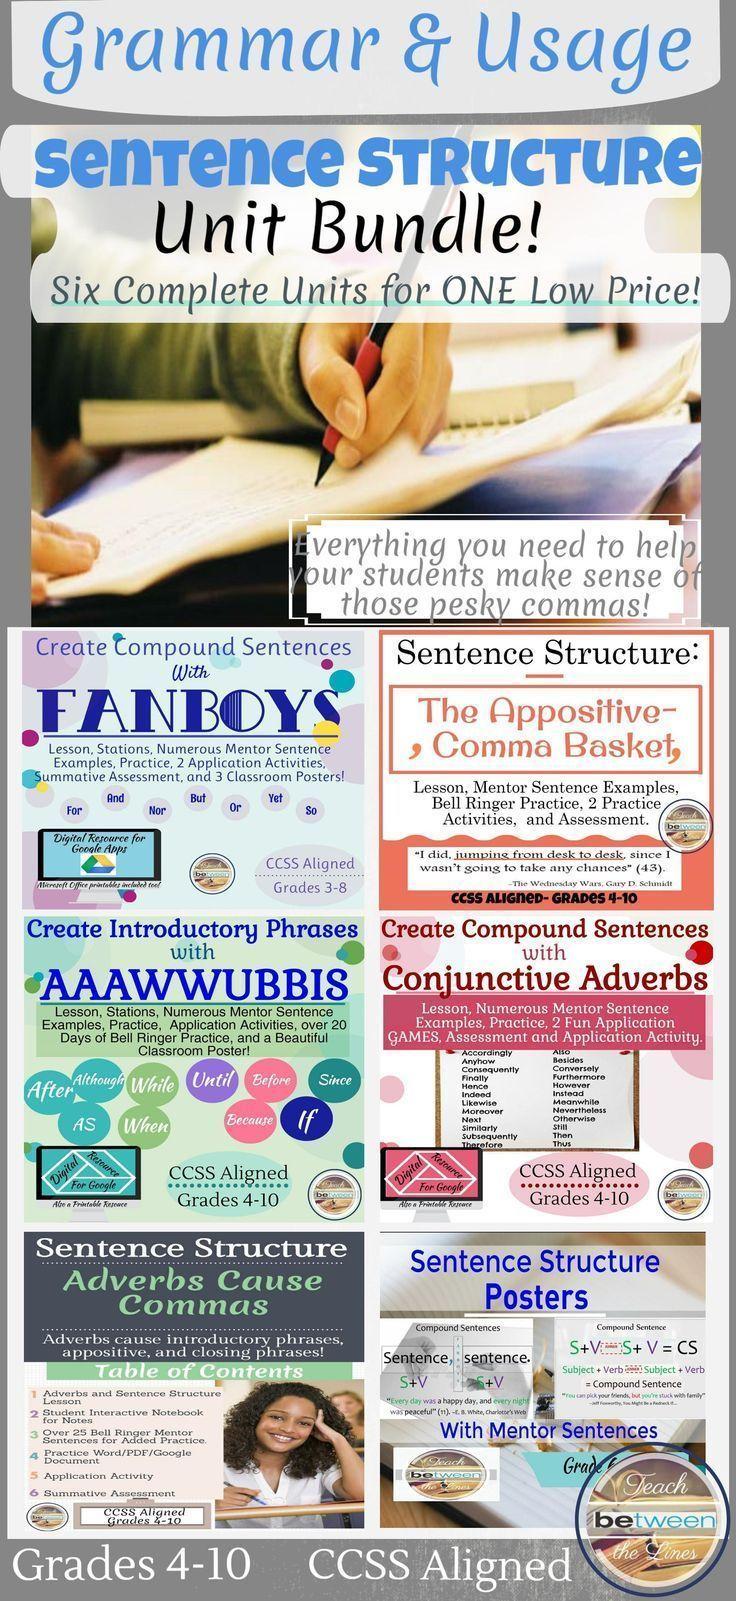 Best 25 teaching mechanics images on pinterest teaching grammar grammar complete sentence structure unit bundle understanding commas fandeluxe Gallery